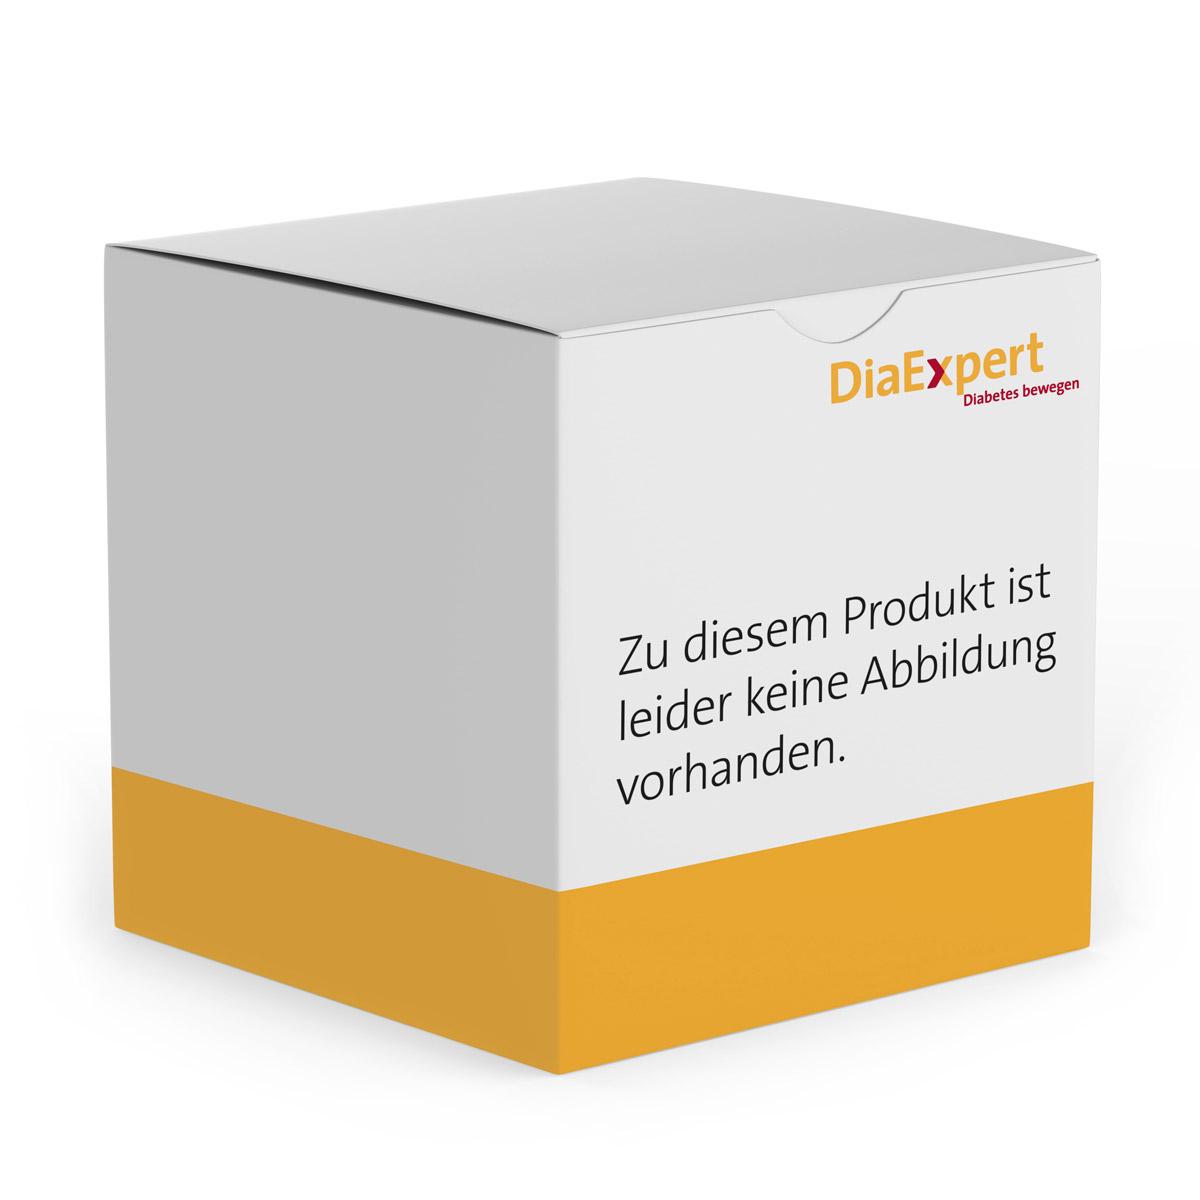 GlucoMen areo 2K Set mmol/ L